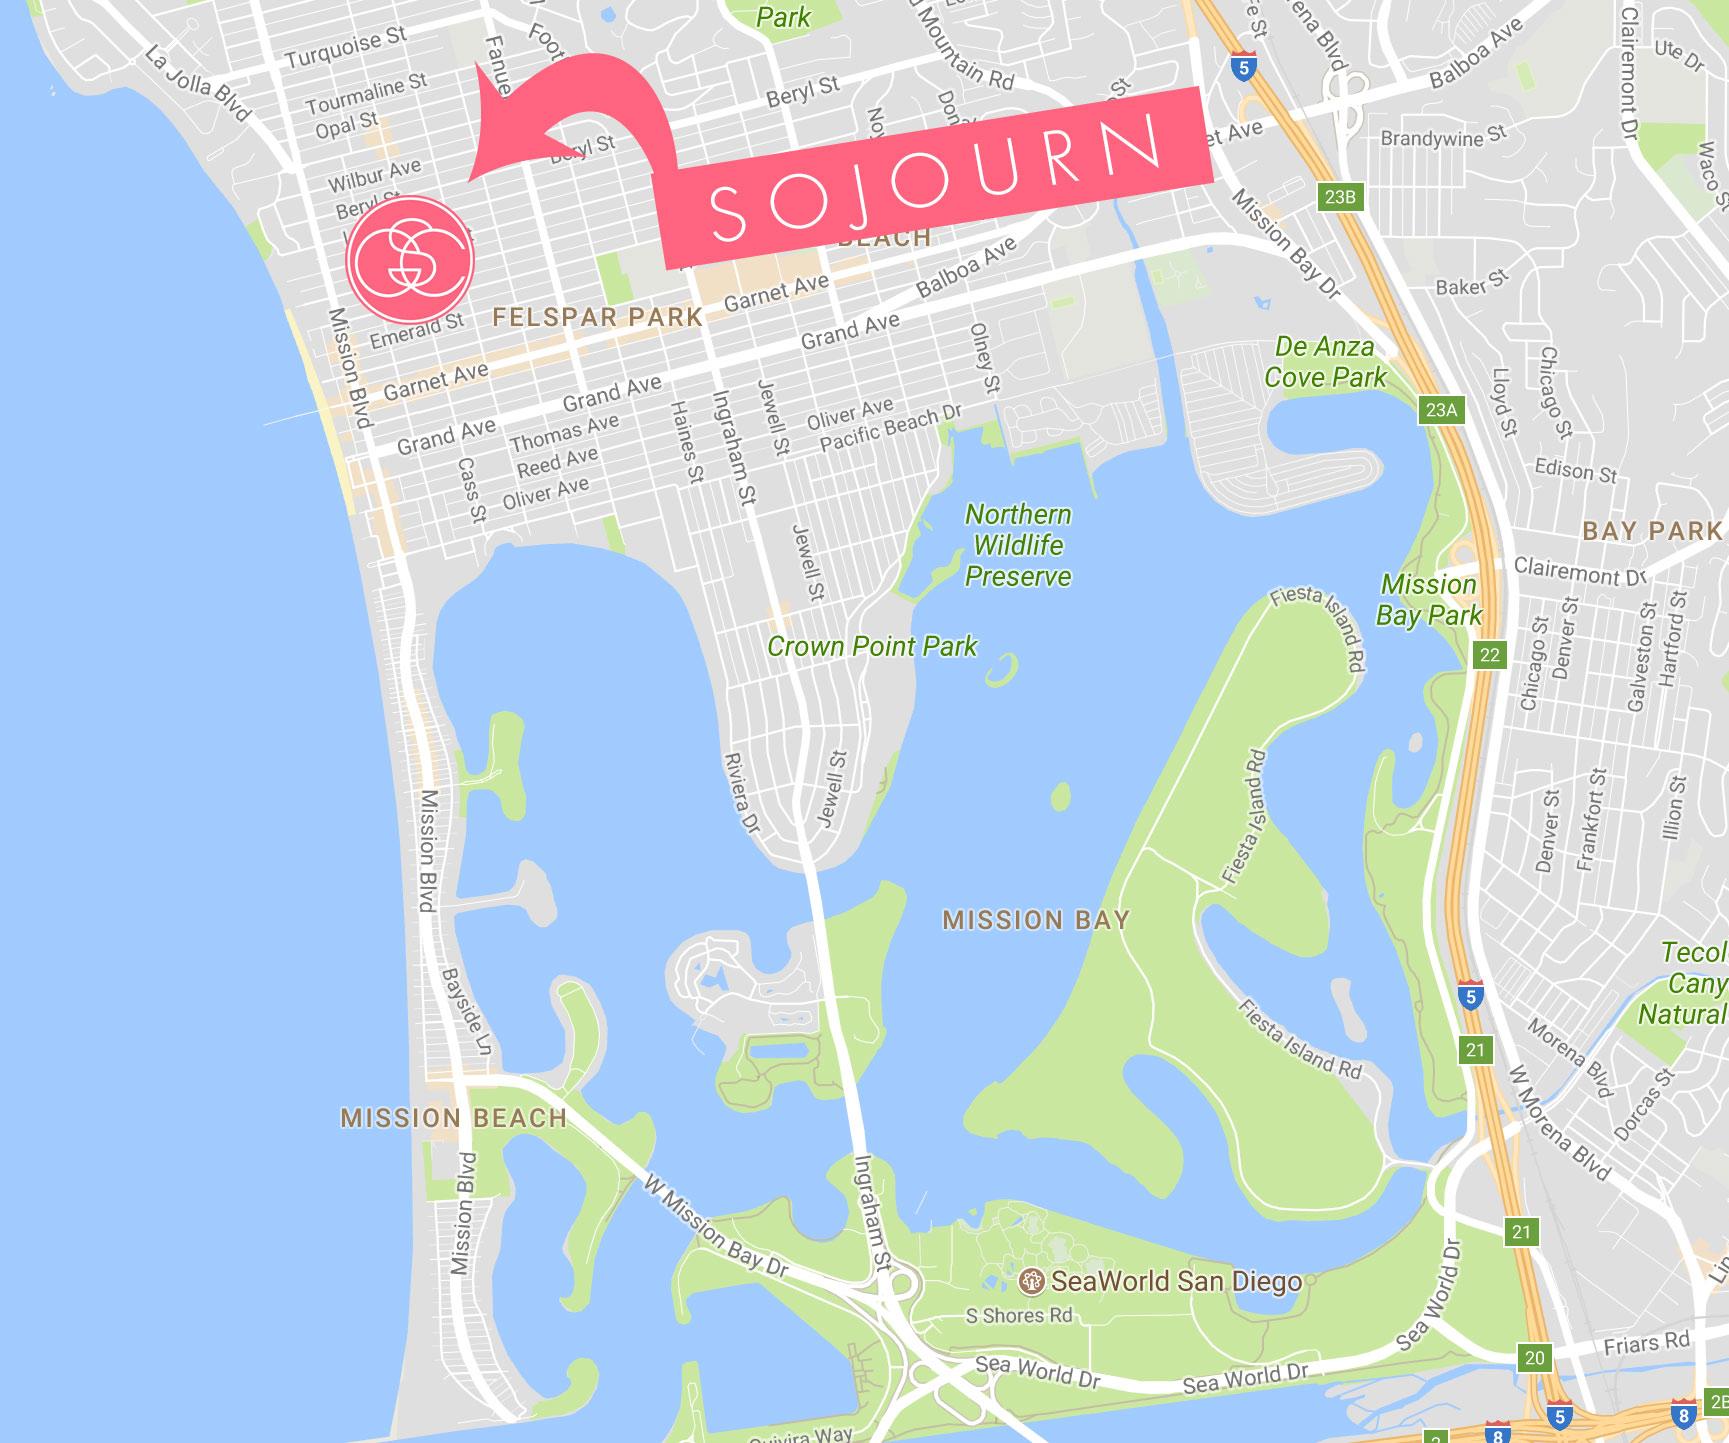 location-arrow-at-clpb.jpg